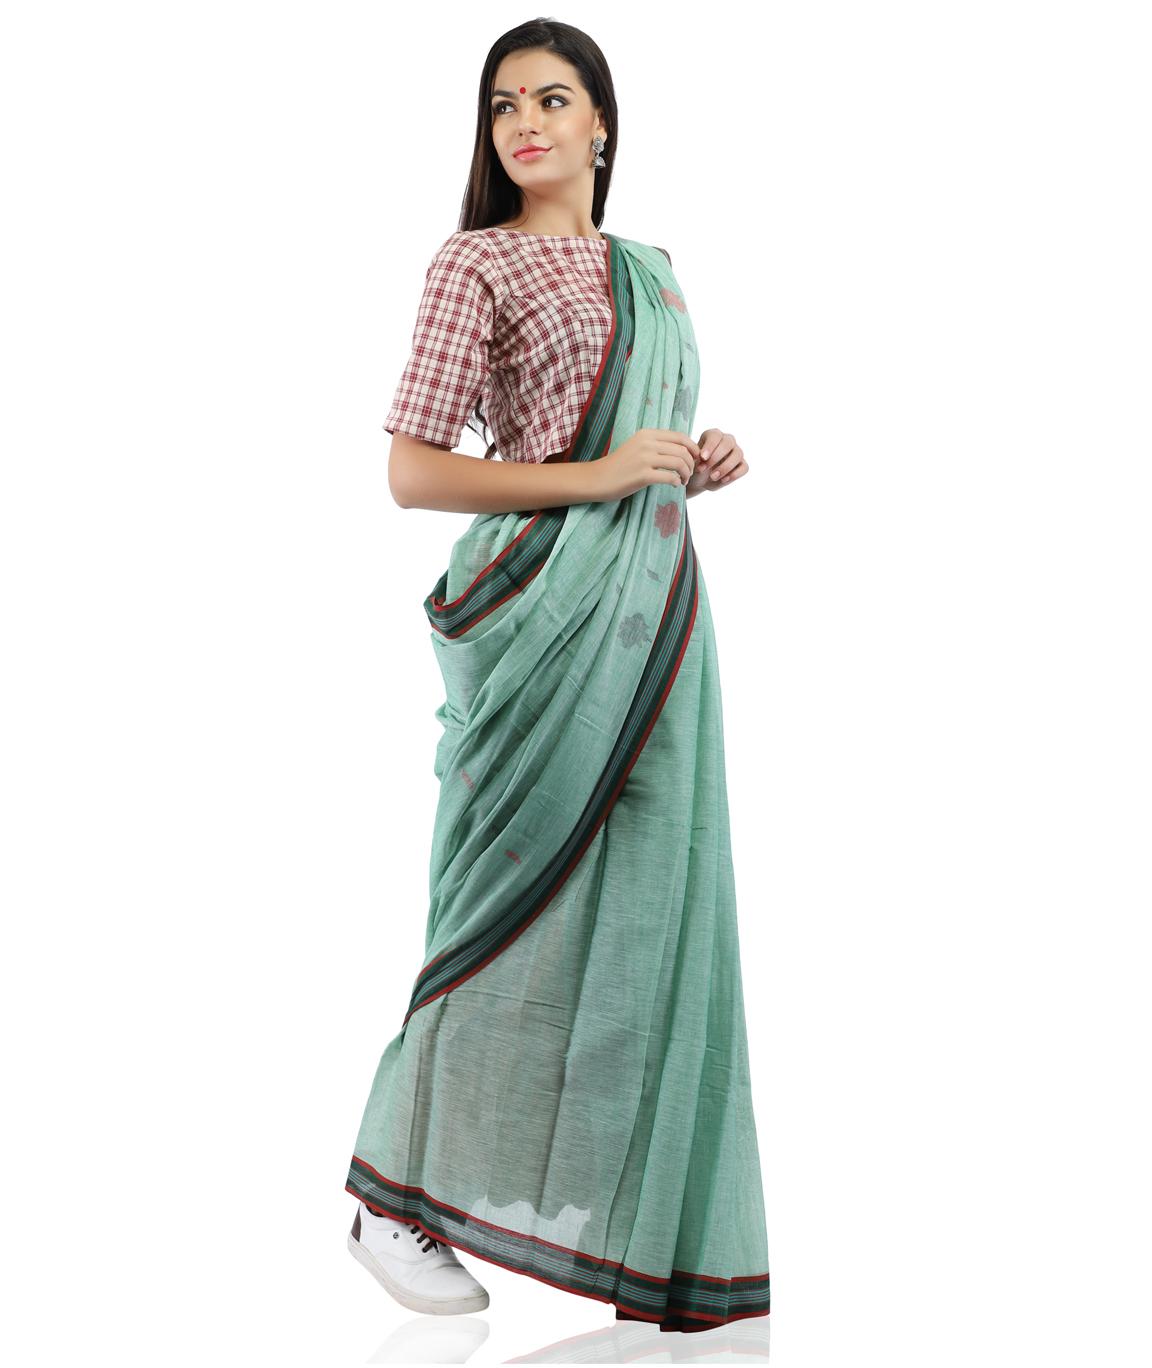 Pure Cotton Jamdani Handloom Saree in Pastel Green